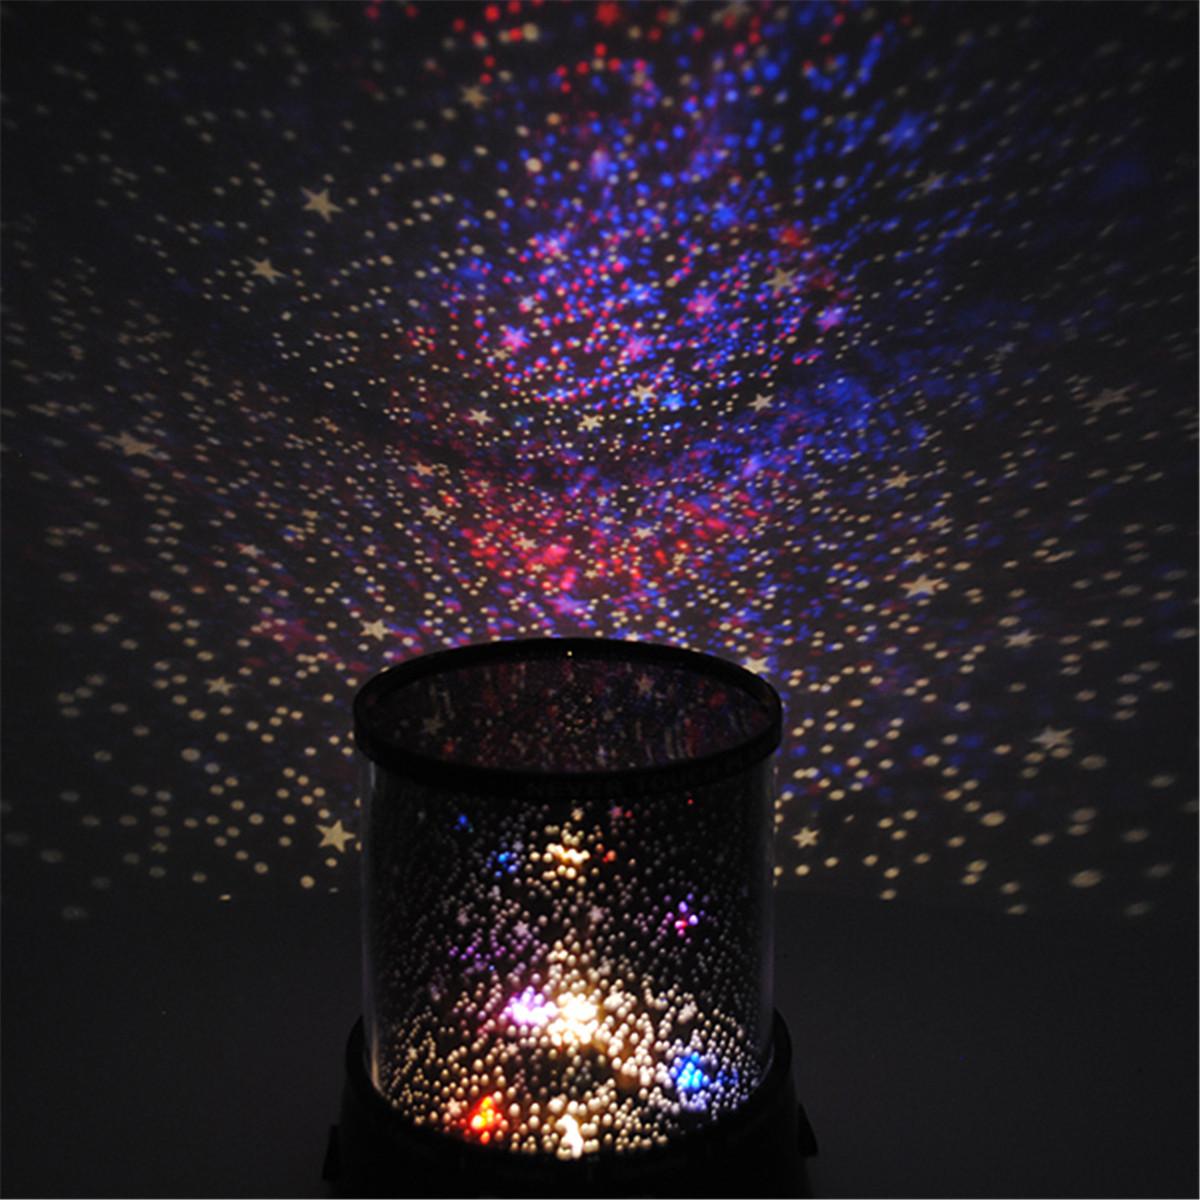 Night light projector lamp - Romantic Led Starry Night Sky Projector Lamp Xmas Gift Star Light